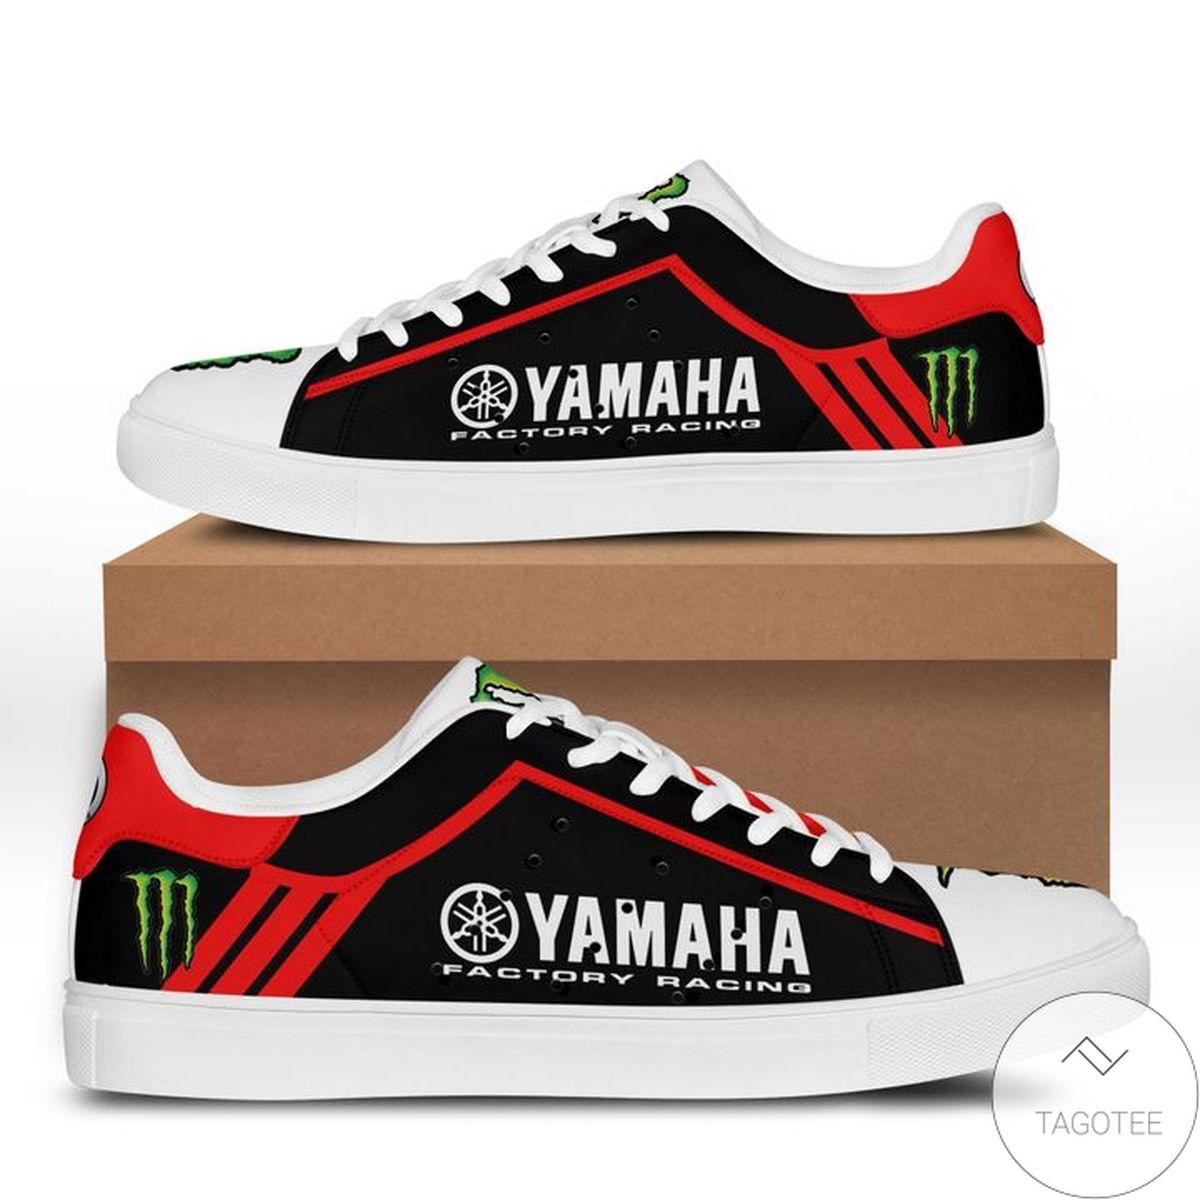 Funny Tee Yamaha Racing Red Black Stan Smith Shoes